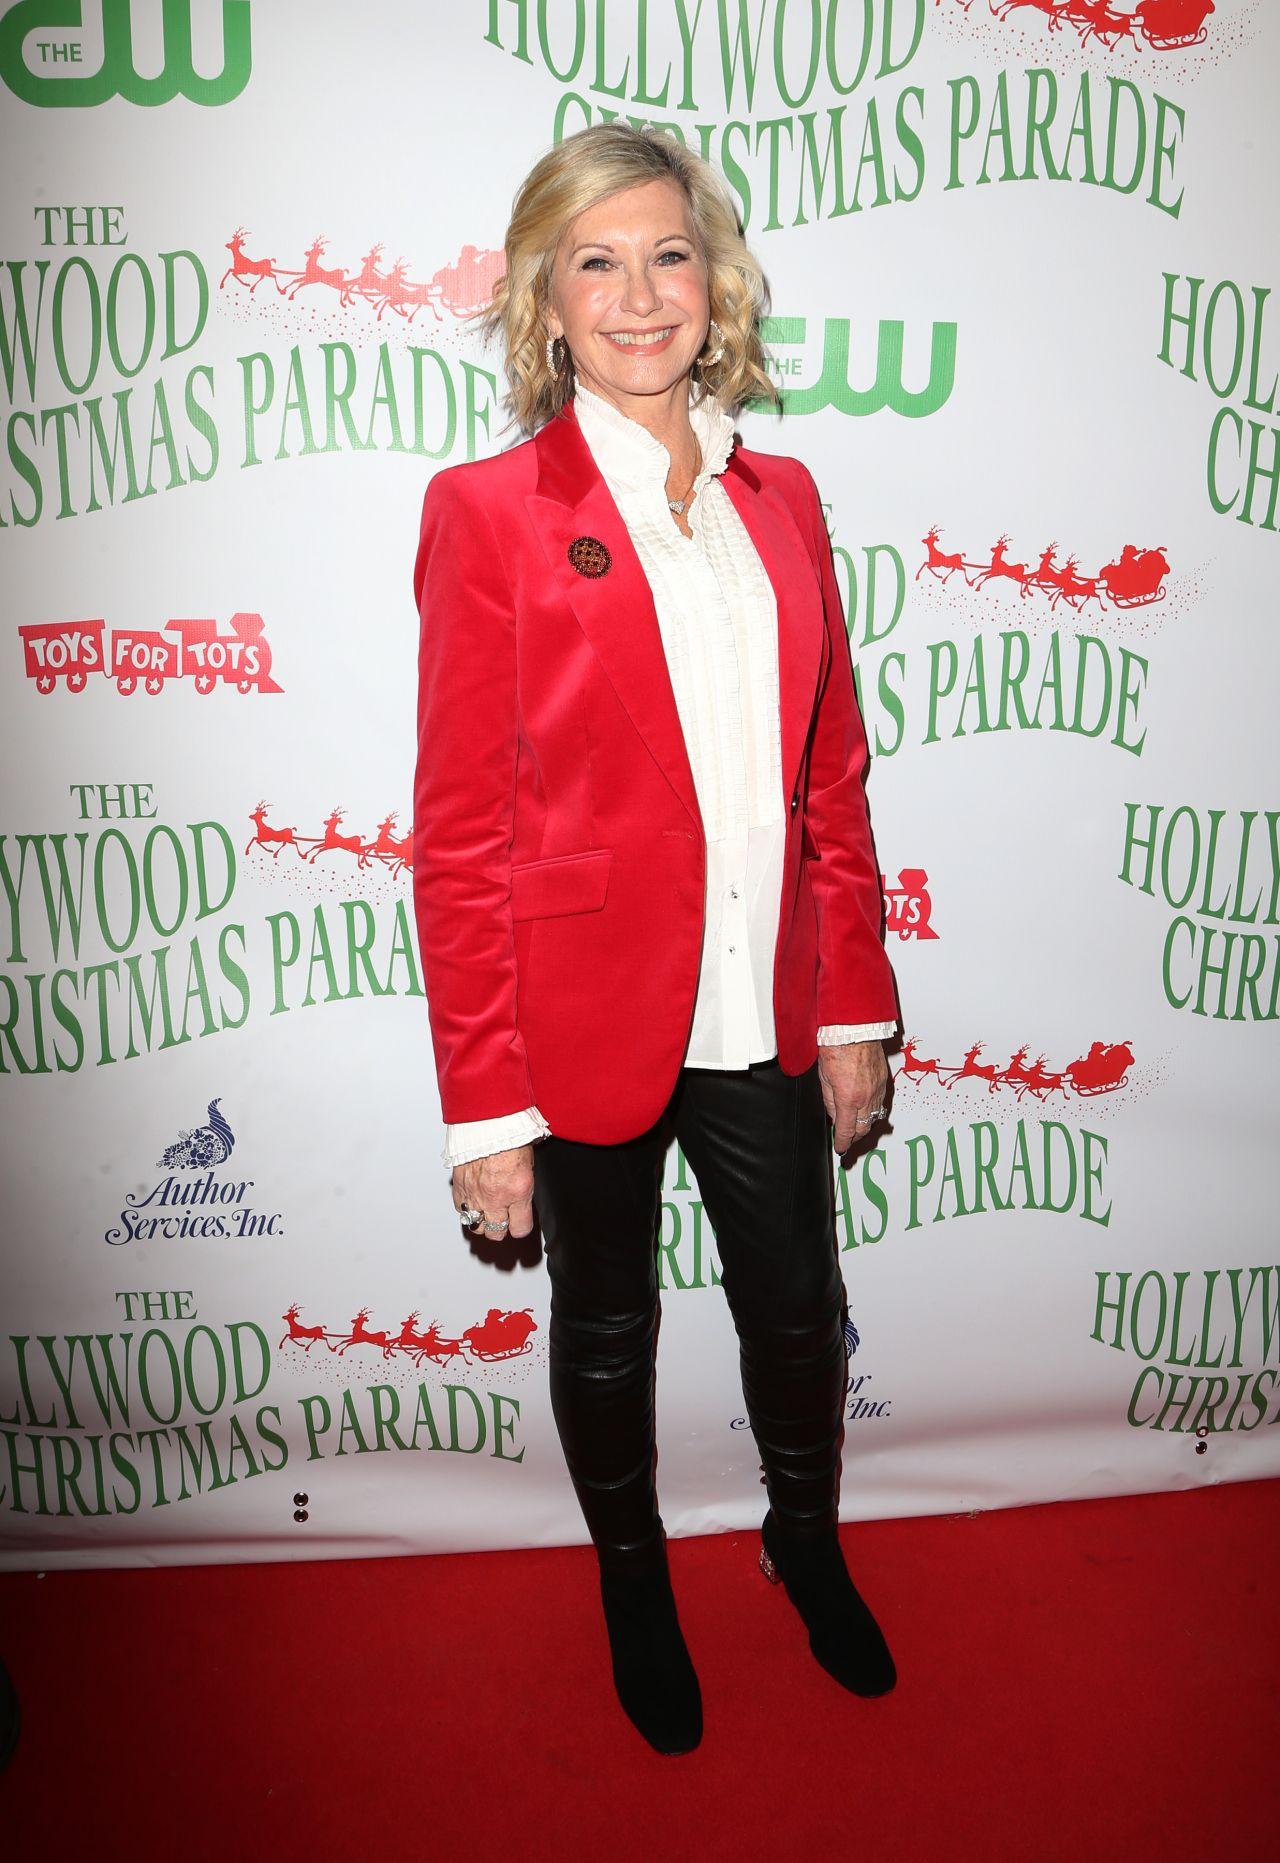 olivia newton john 85th annual hollywood christmas parade in hollywood 1127 2016 - Olivia Newton John This Christmas